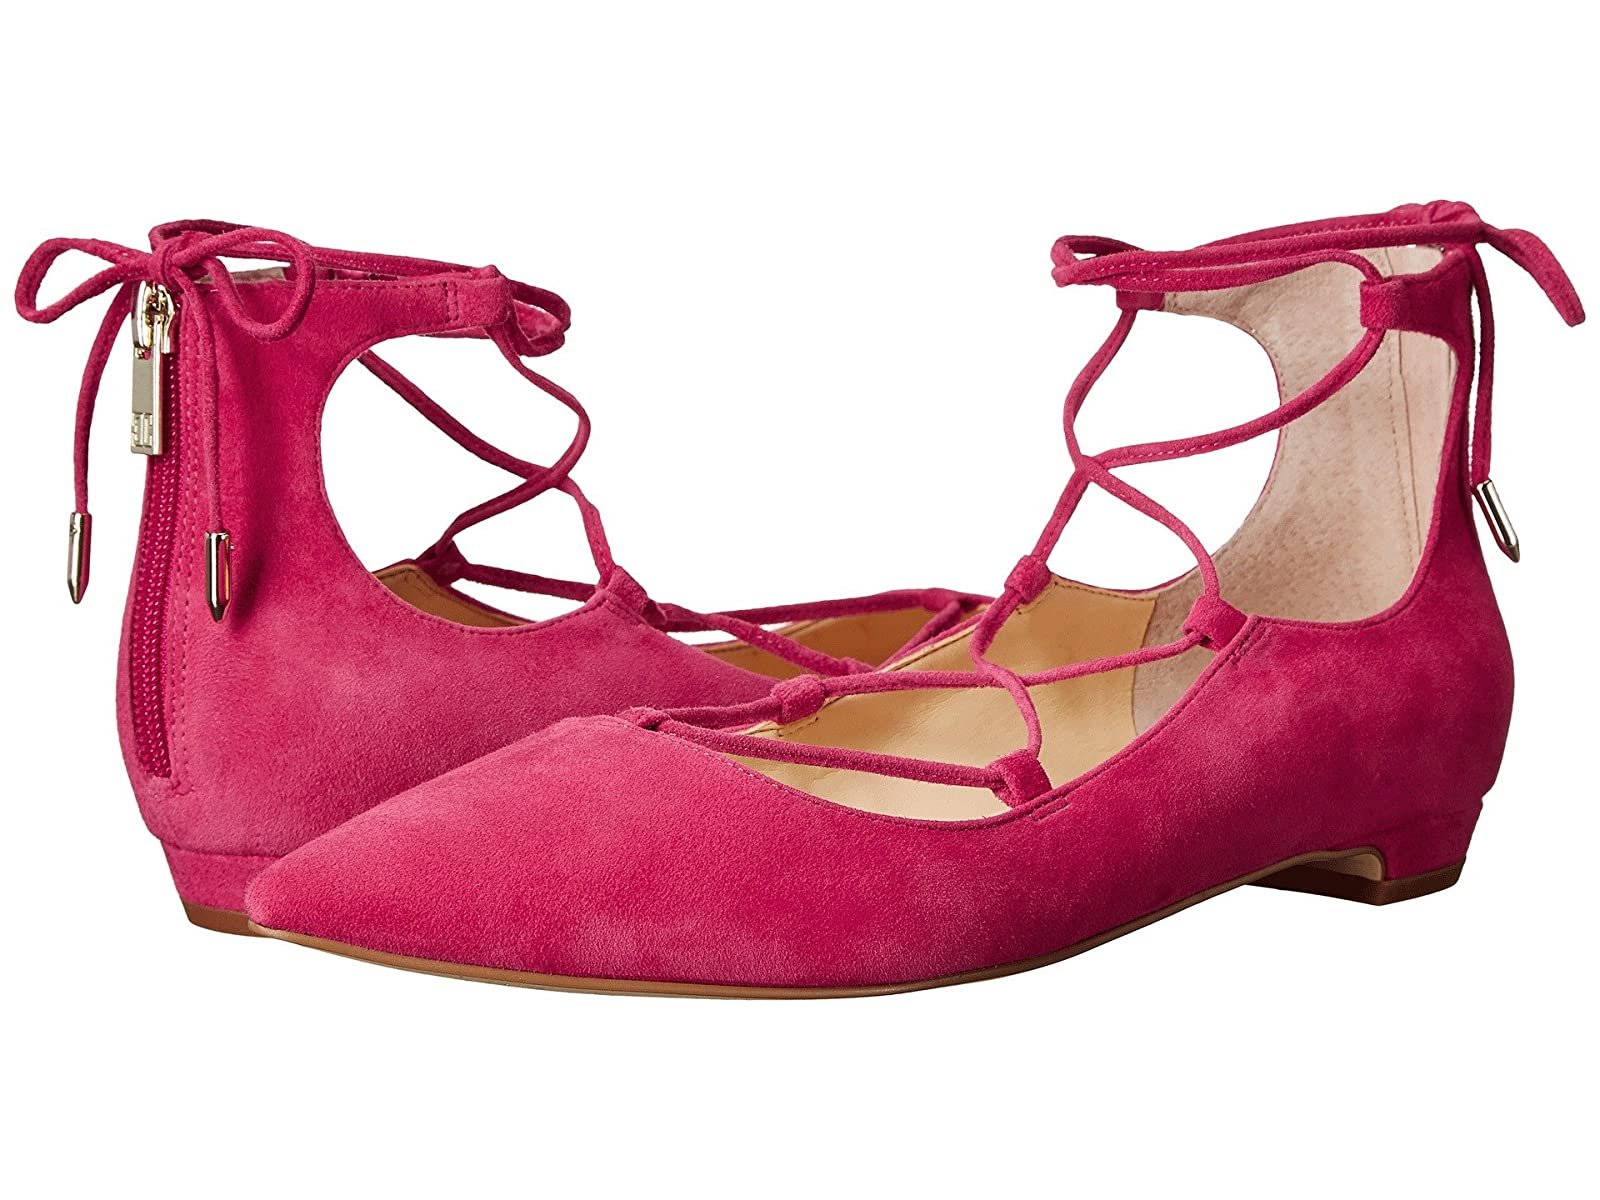 Ivanka Trump TropicaCheap and distinctive eye-catching shoes